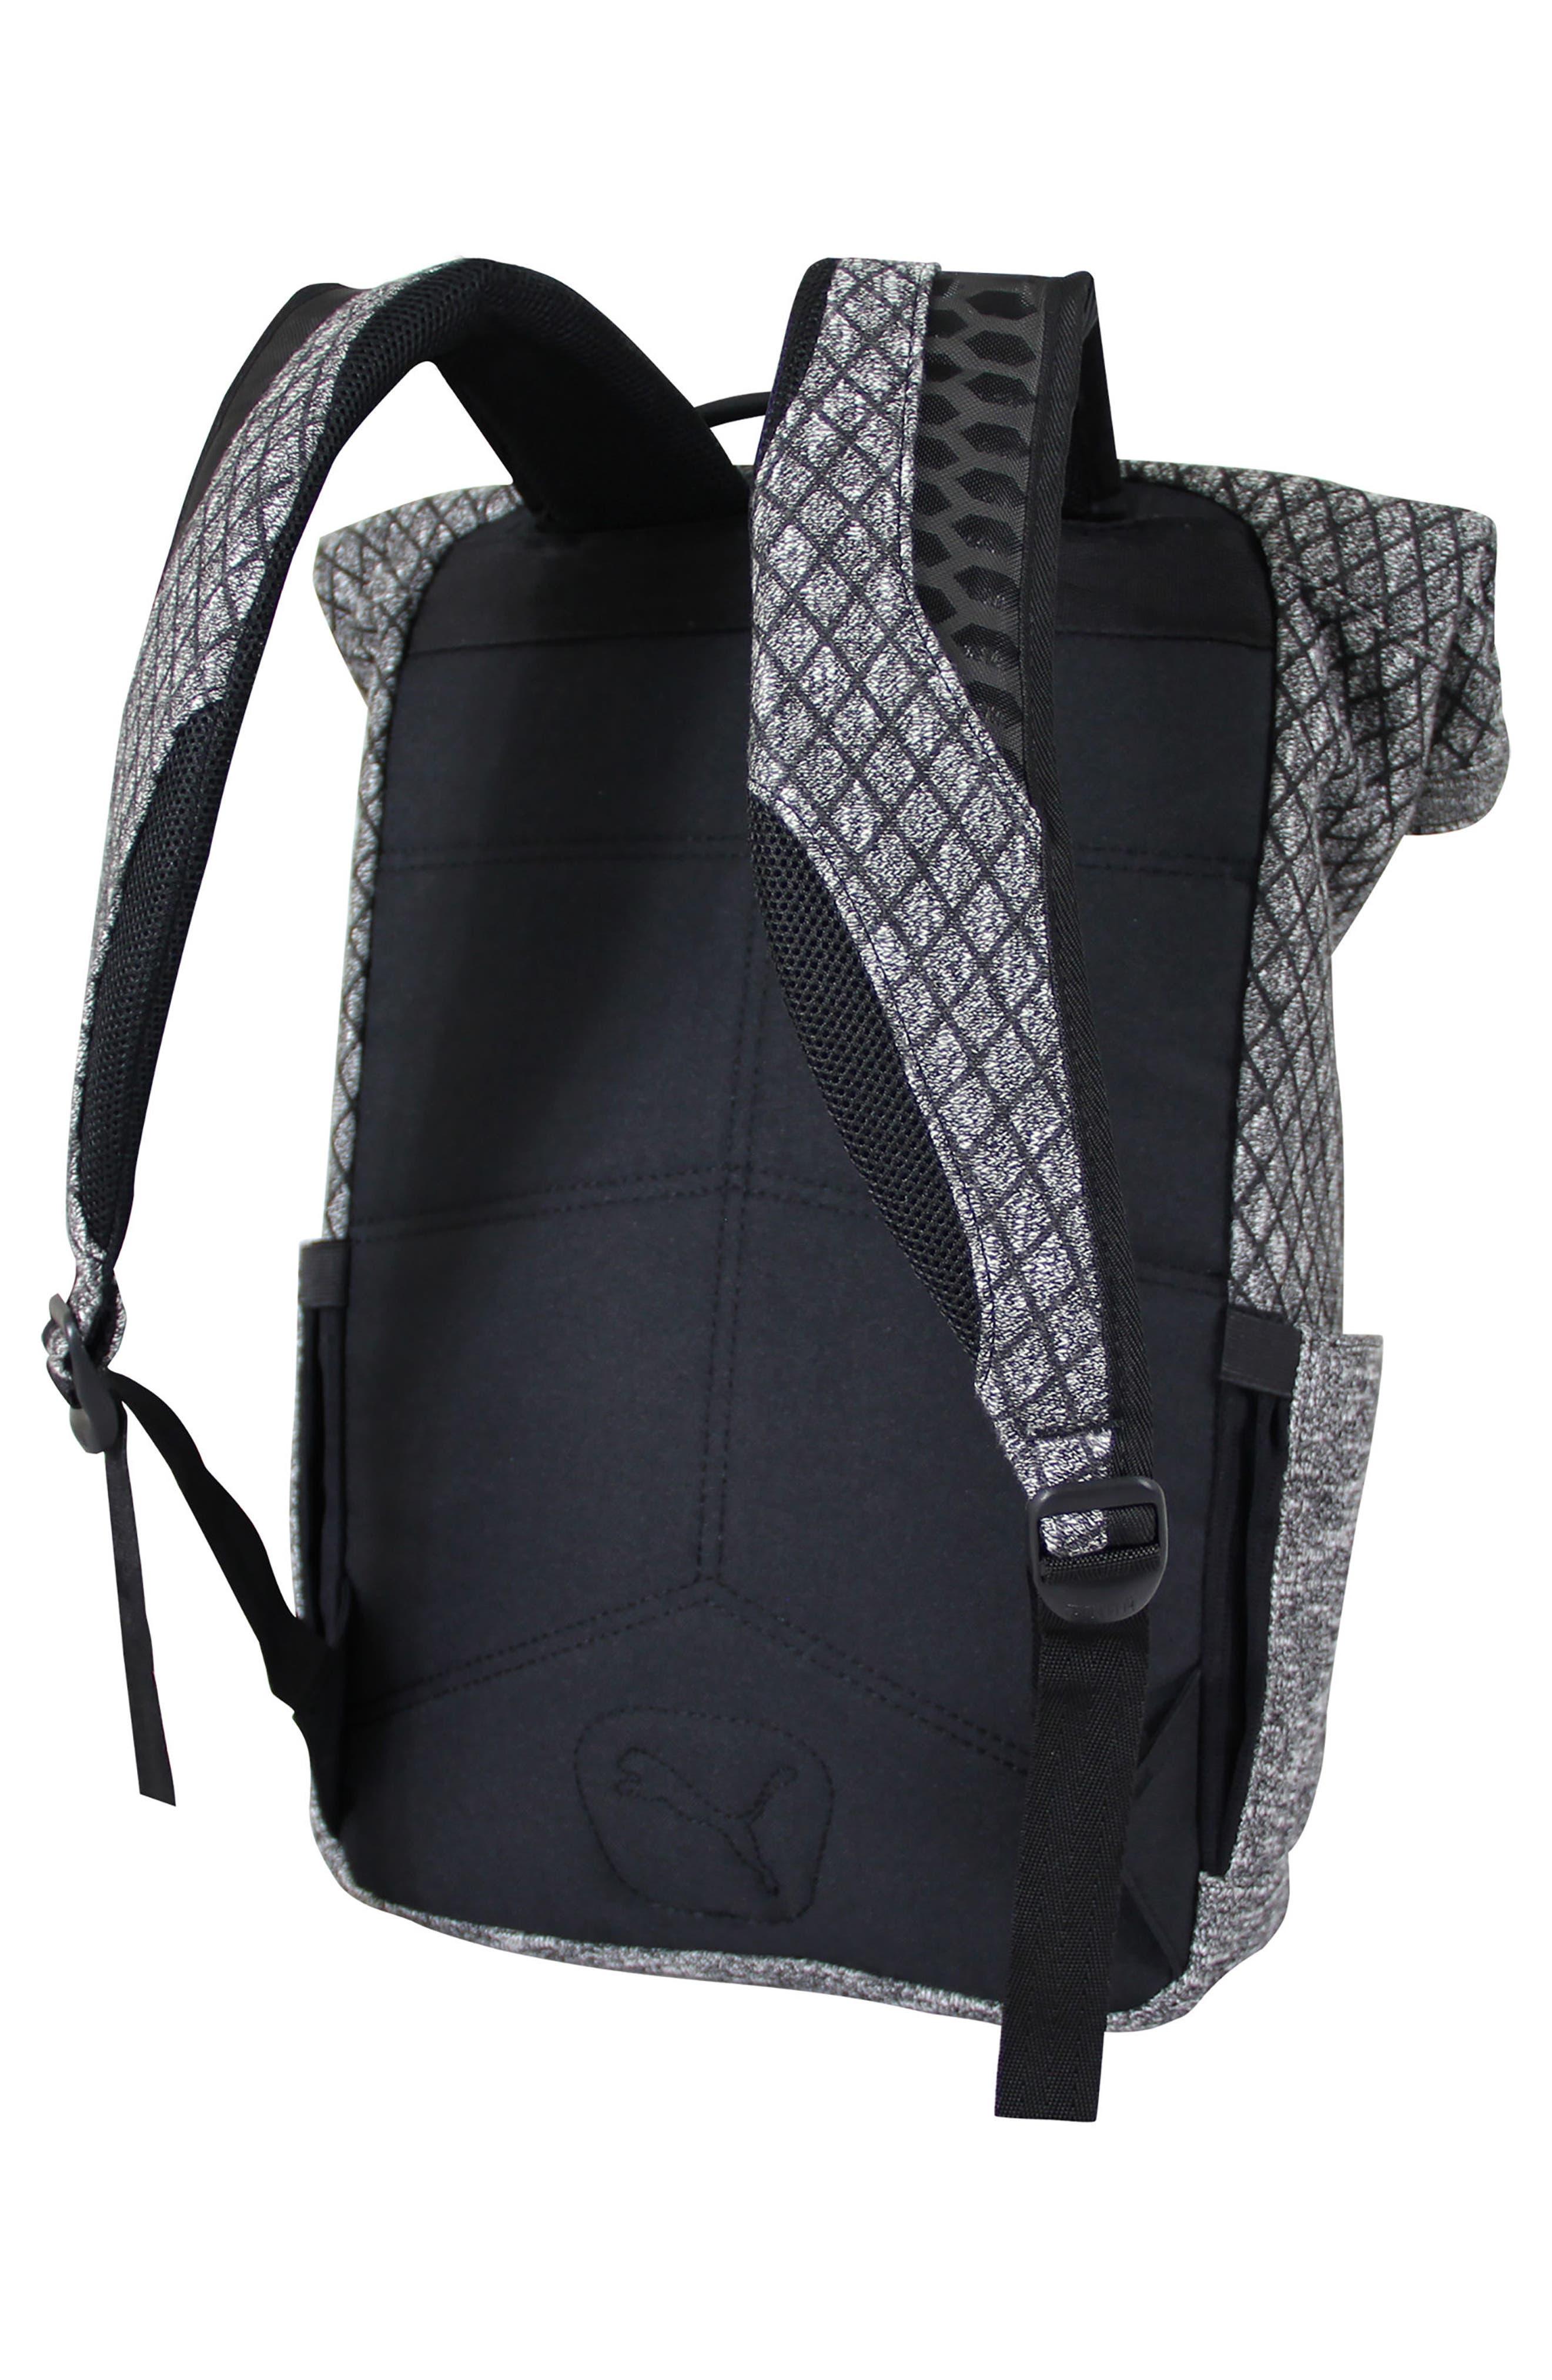 Evo 2.0 Foldover Top Knit Backpack,                             Alternate thumbnail 3, color,                             BLACK/ GREY